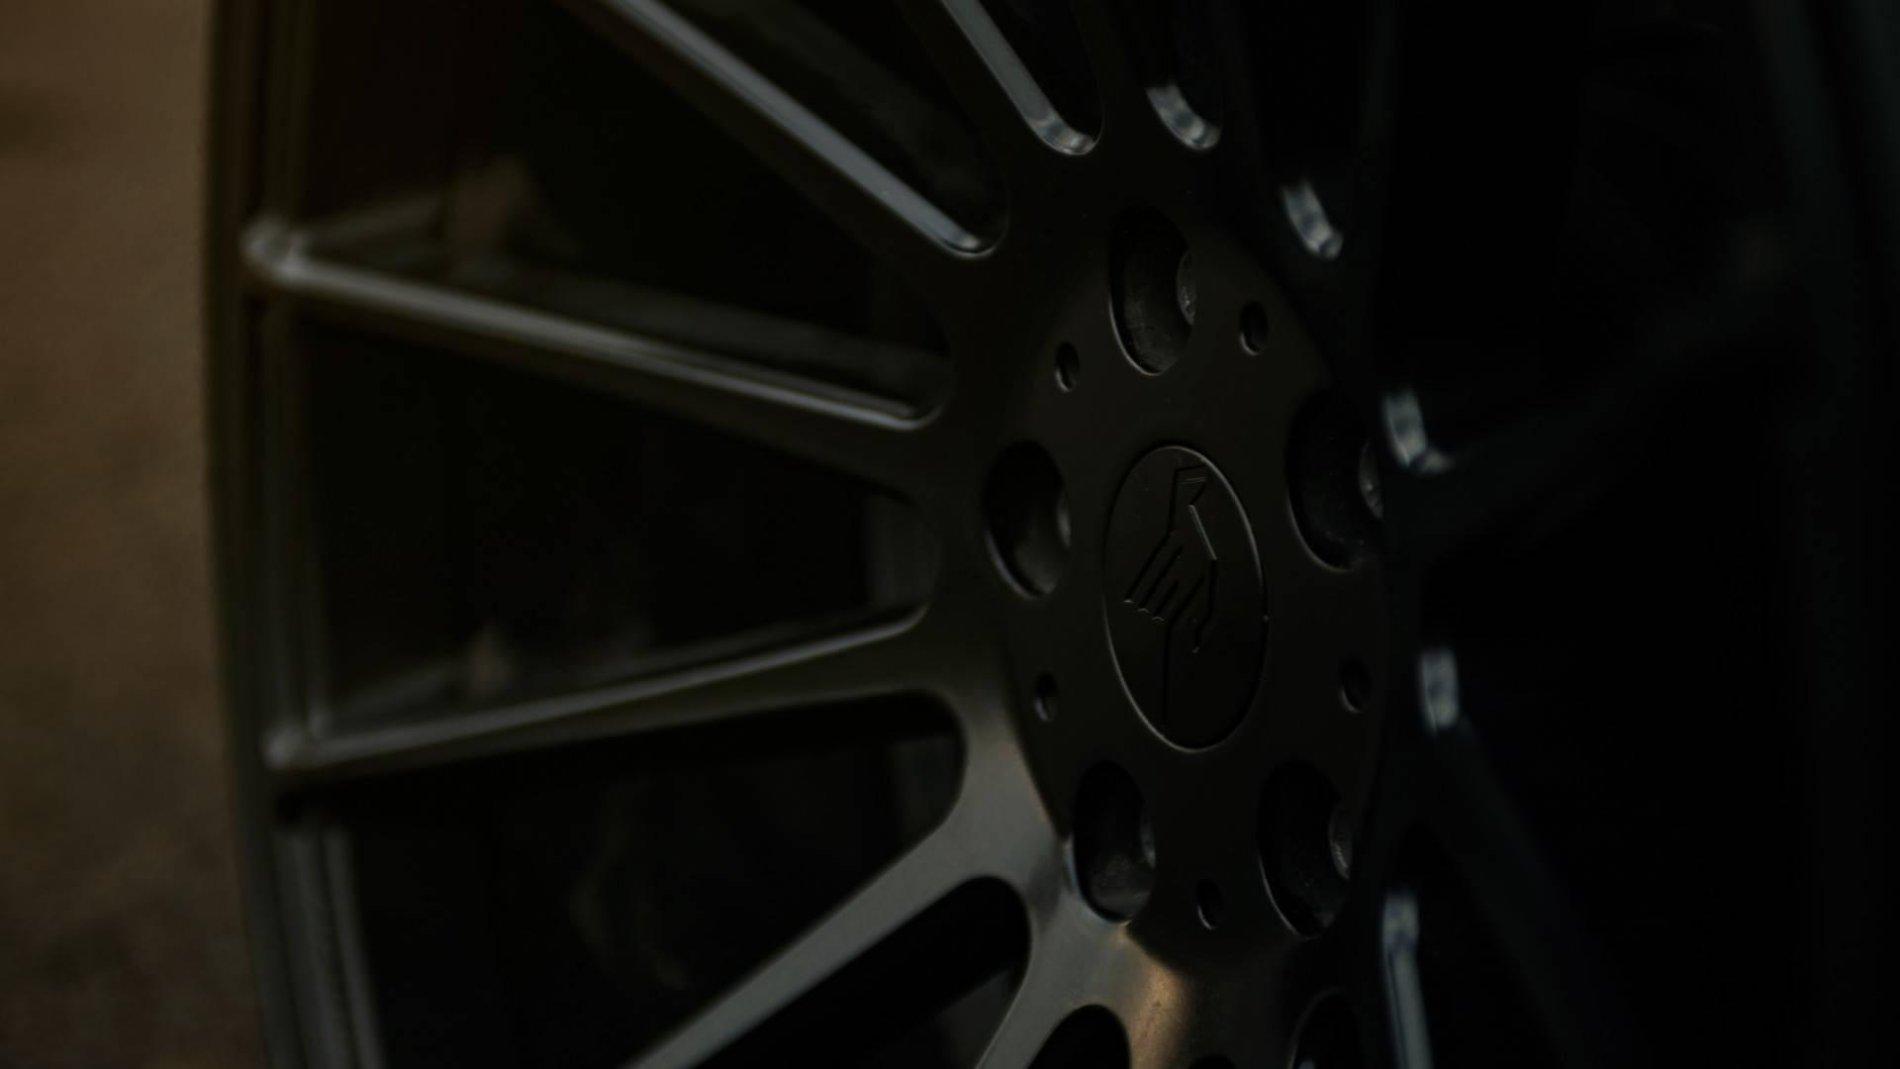 BMW X6 M50d de la Fostla - BMW X6 M50d de la Fostla